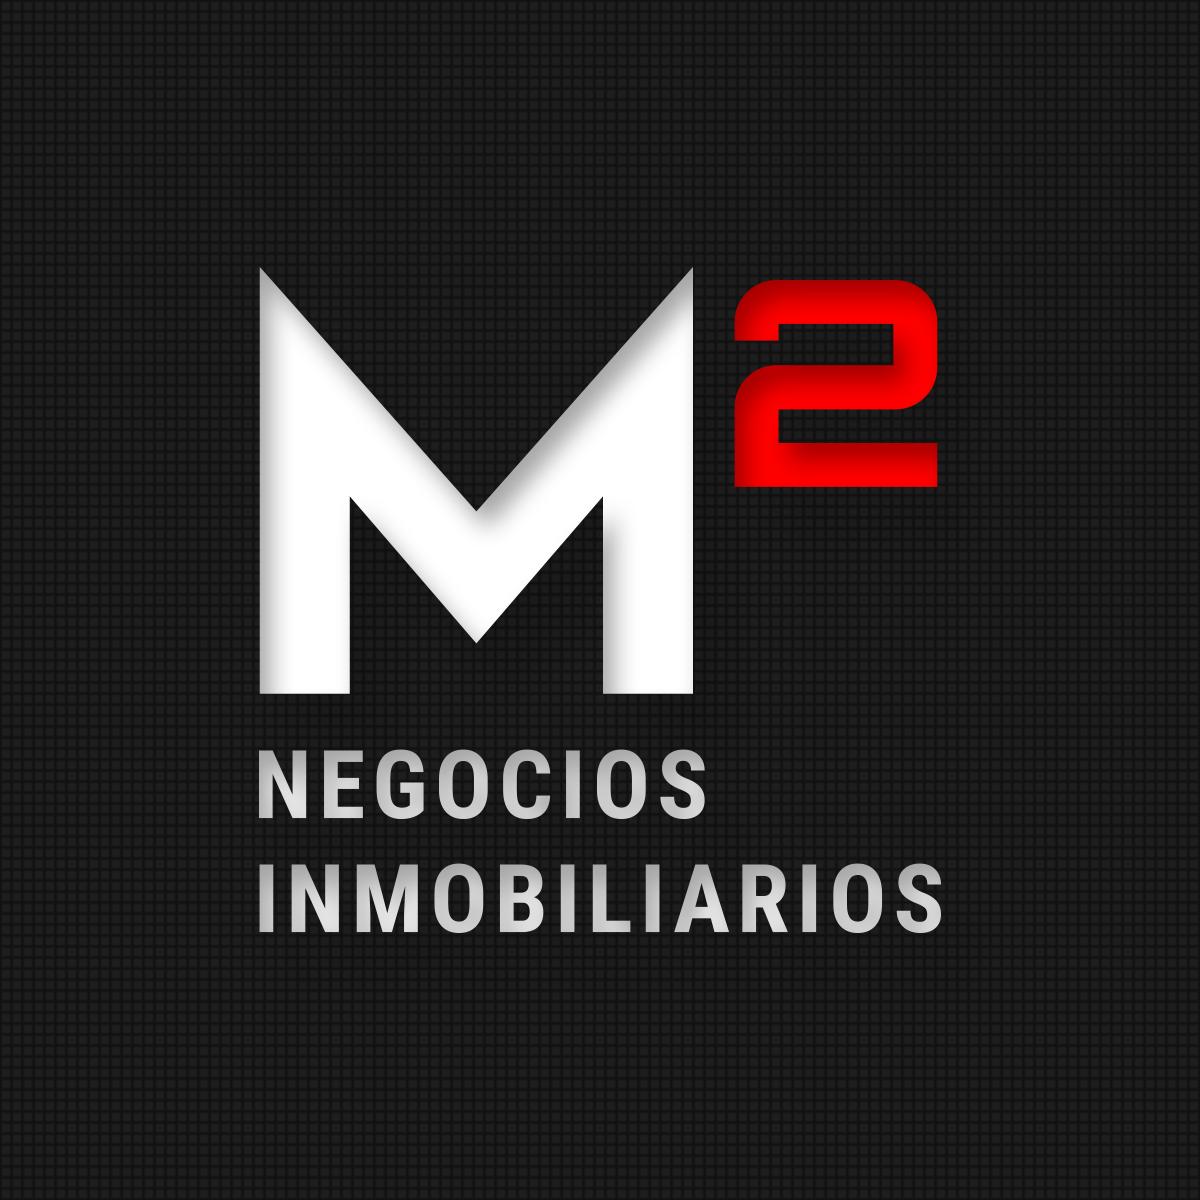 Metro² Negocios Inmobiliarios - NQN Propiedades